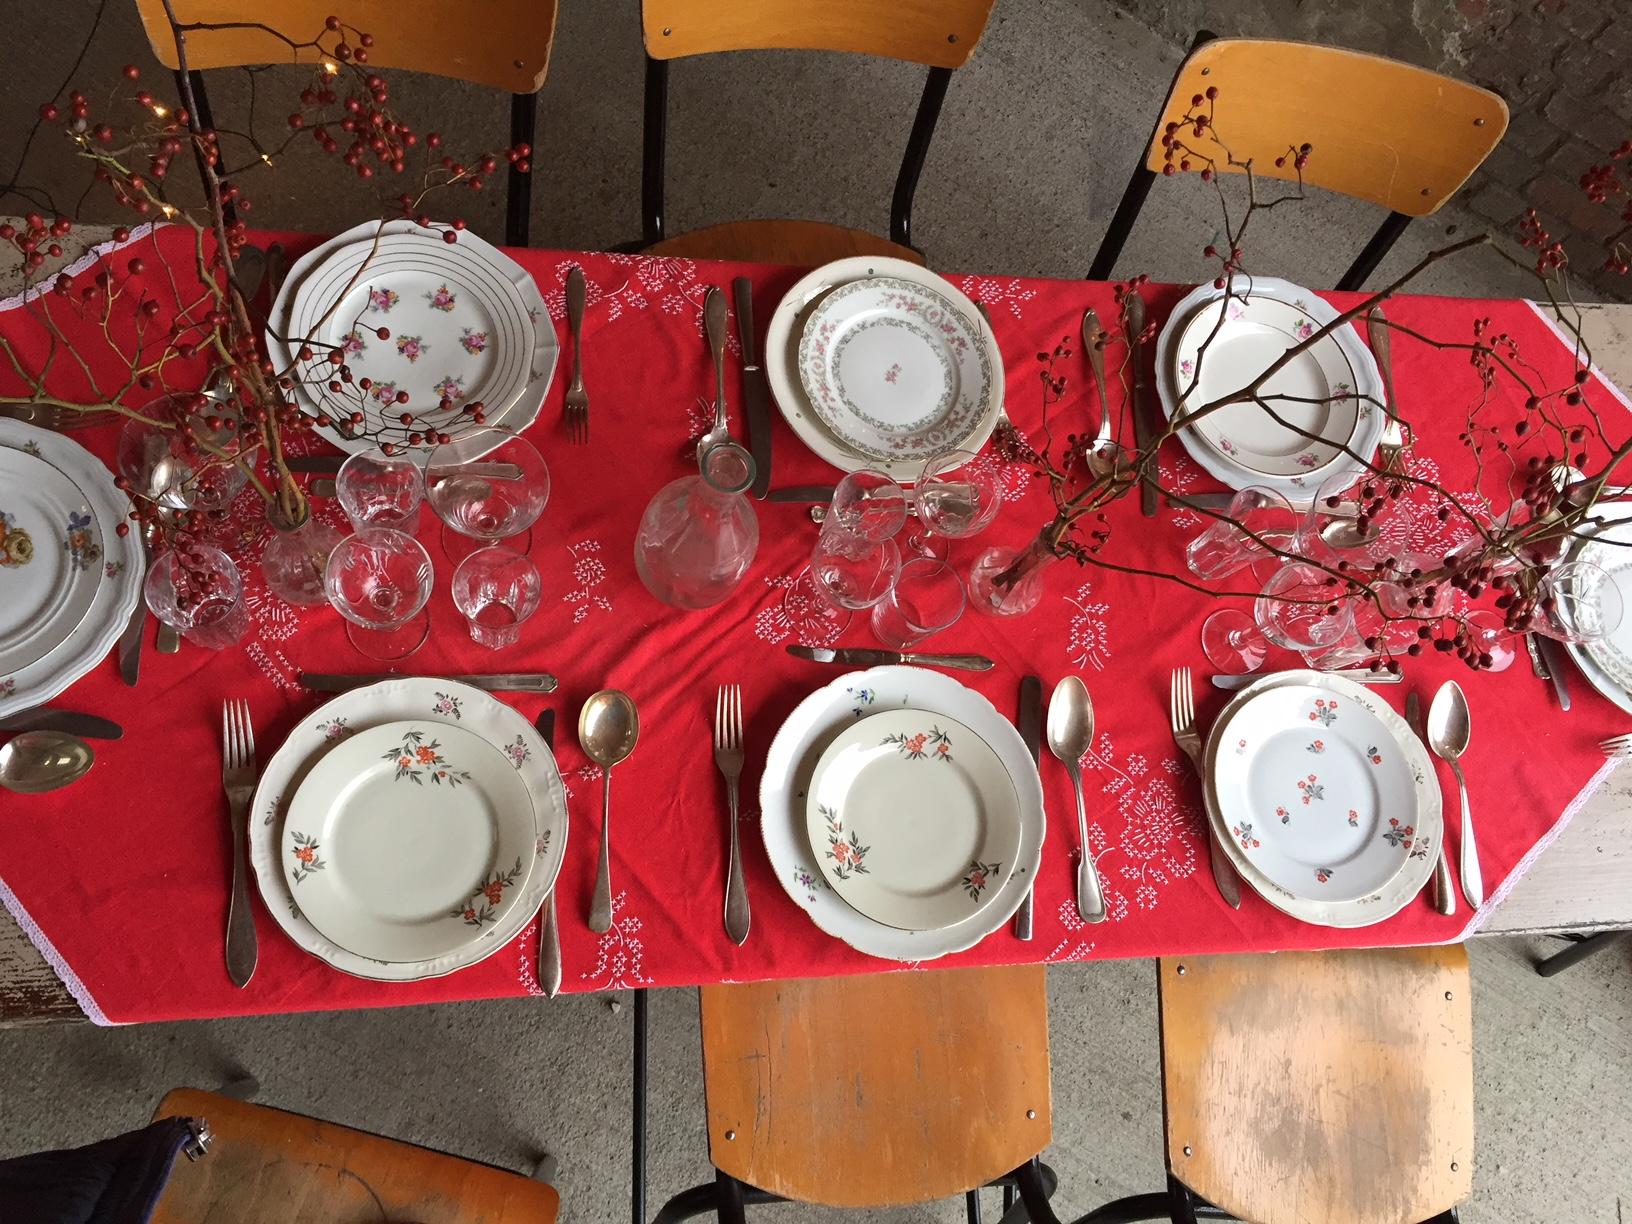 Vaisselle dépareillée